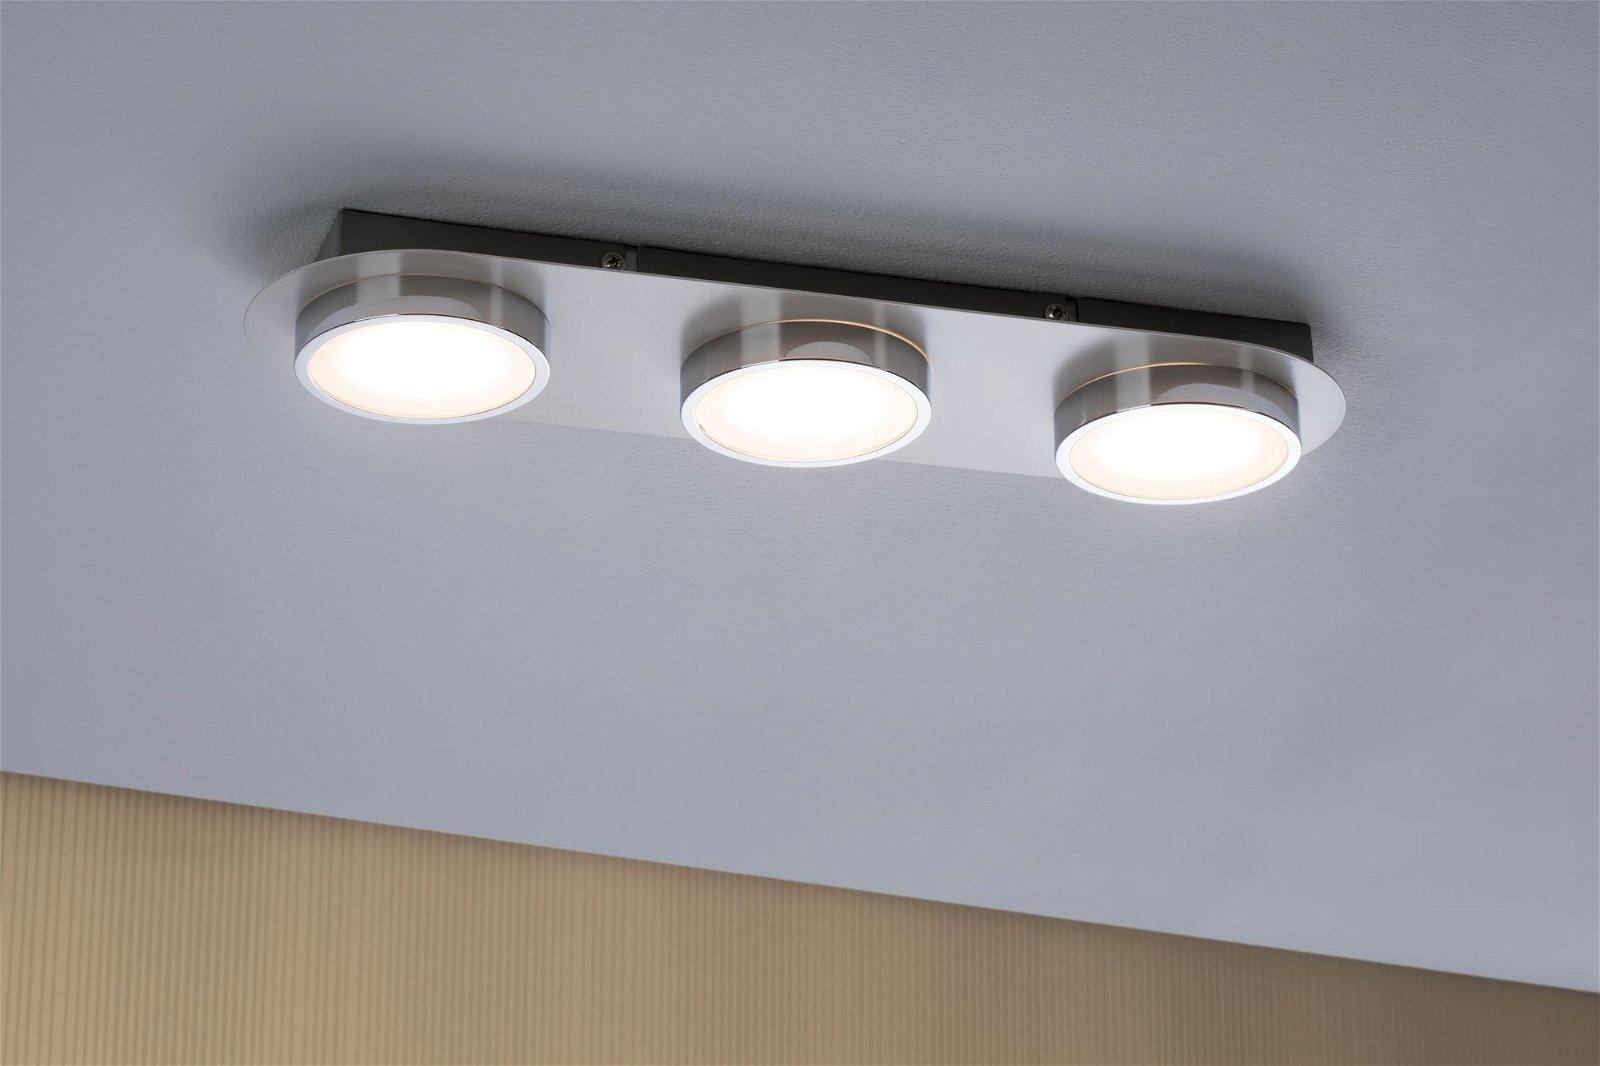 LED Deckenleuchte Liao 3000K 3x430lm 230V 3x4,7W Weiß matt/Chrom